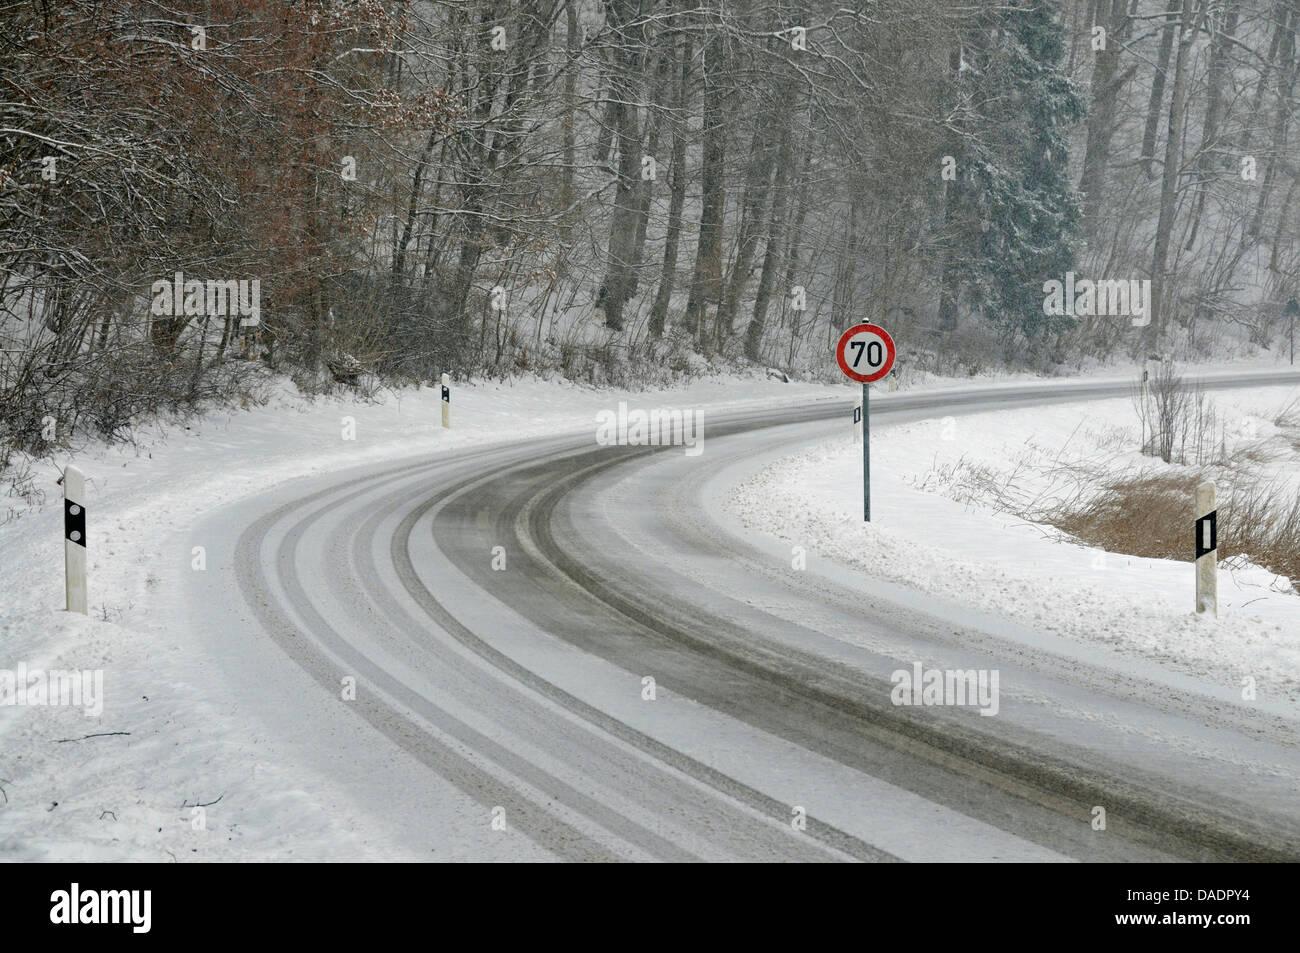 snow-slicked road in shower of sleet, Germany, Baden-Wuerttemberg, Swabian Alb, Kleines Lautertal - Stock Image